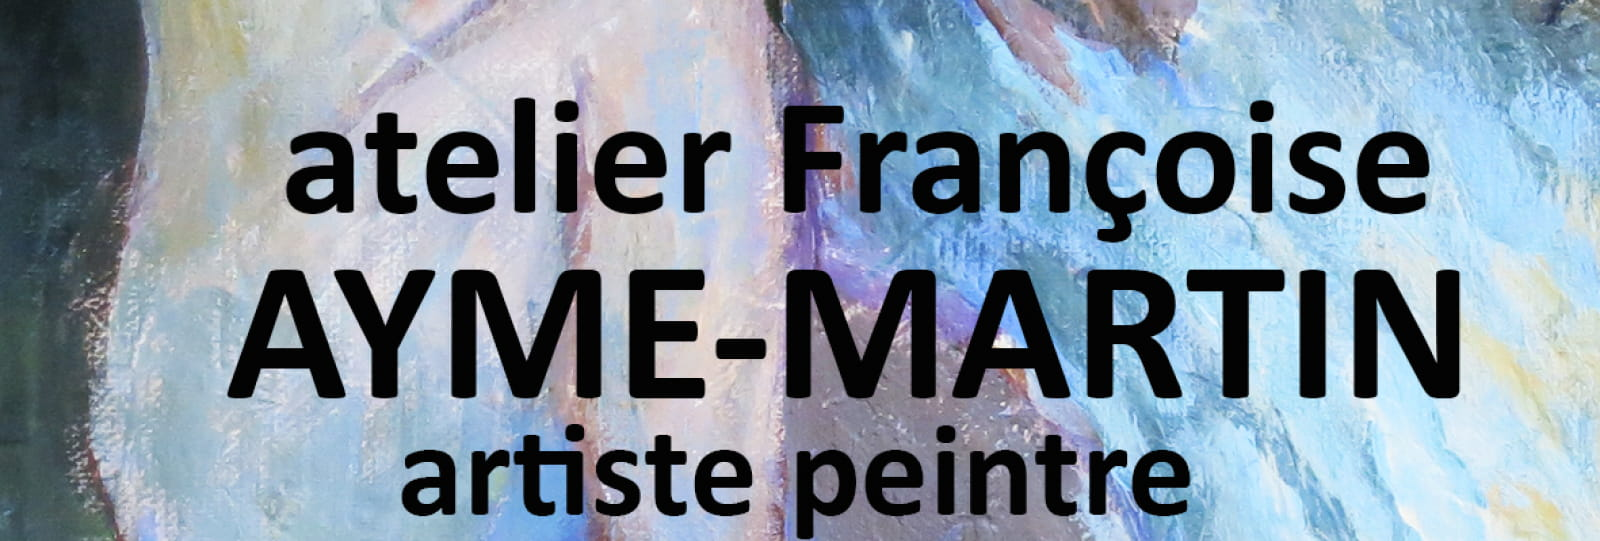 Atelier Françoise Aymé-Martin